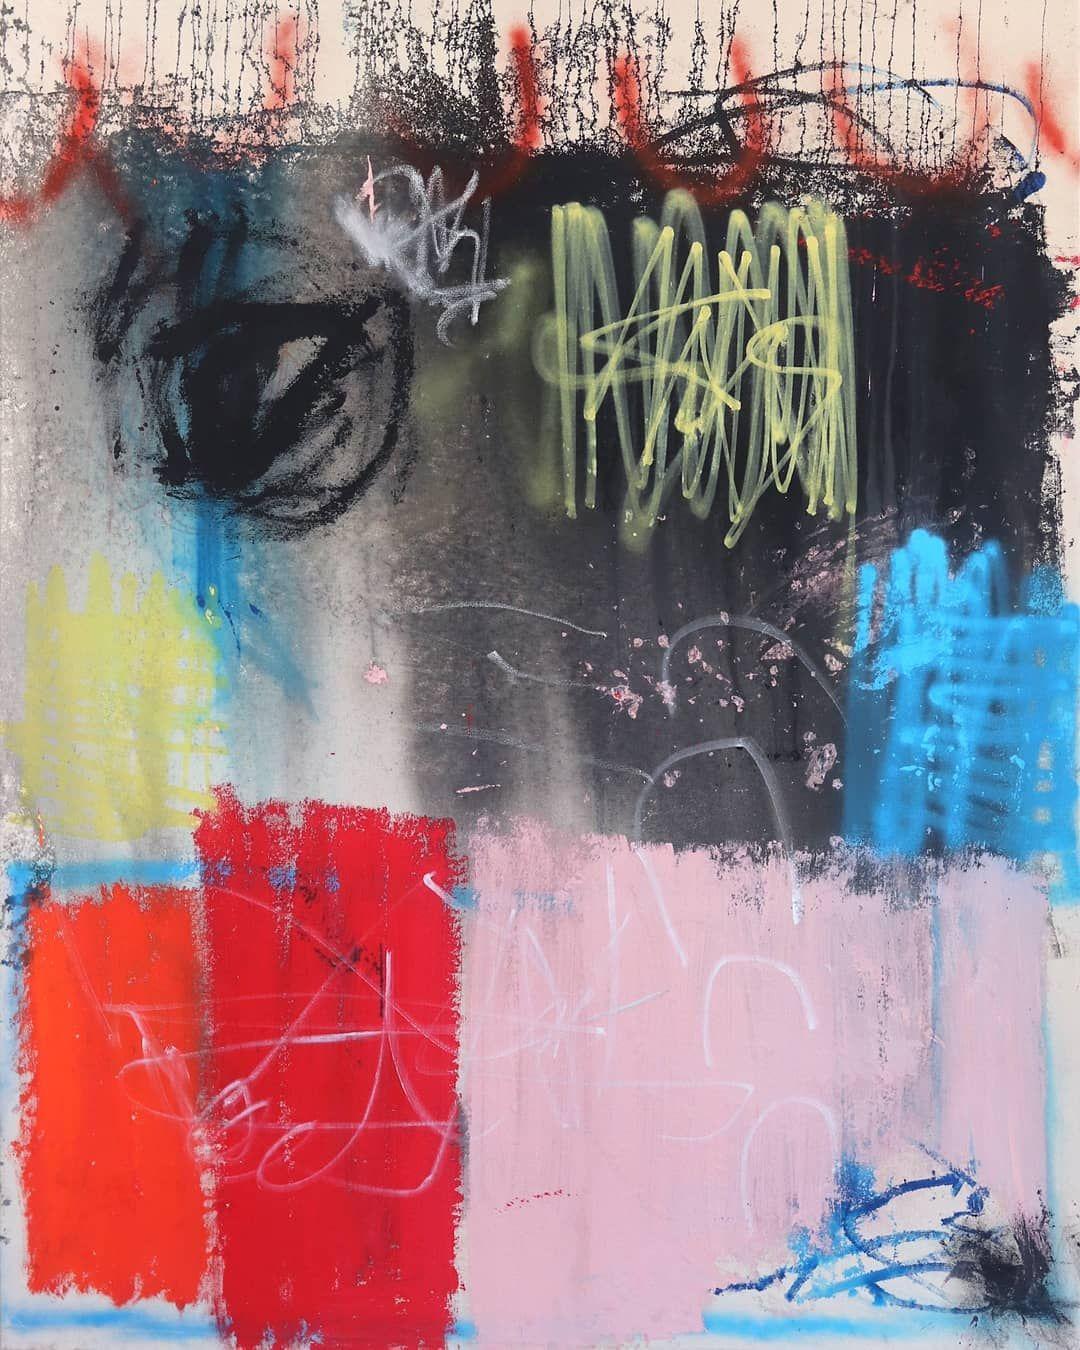 Sarah Svetlana - Sumter Avenue North  Artworks like this and more are available on our website. Link in bio  . . . . . #artwork #originalart #buyart #artspacewarehouse #newart #abstract #abstractart #gesturalabstraction #spraypaintart #largeart #losangeles #laartgallery #artgallery #multicolor